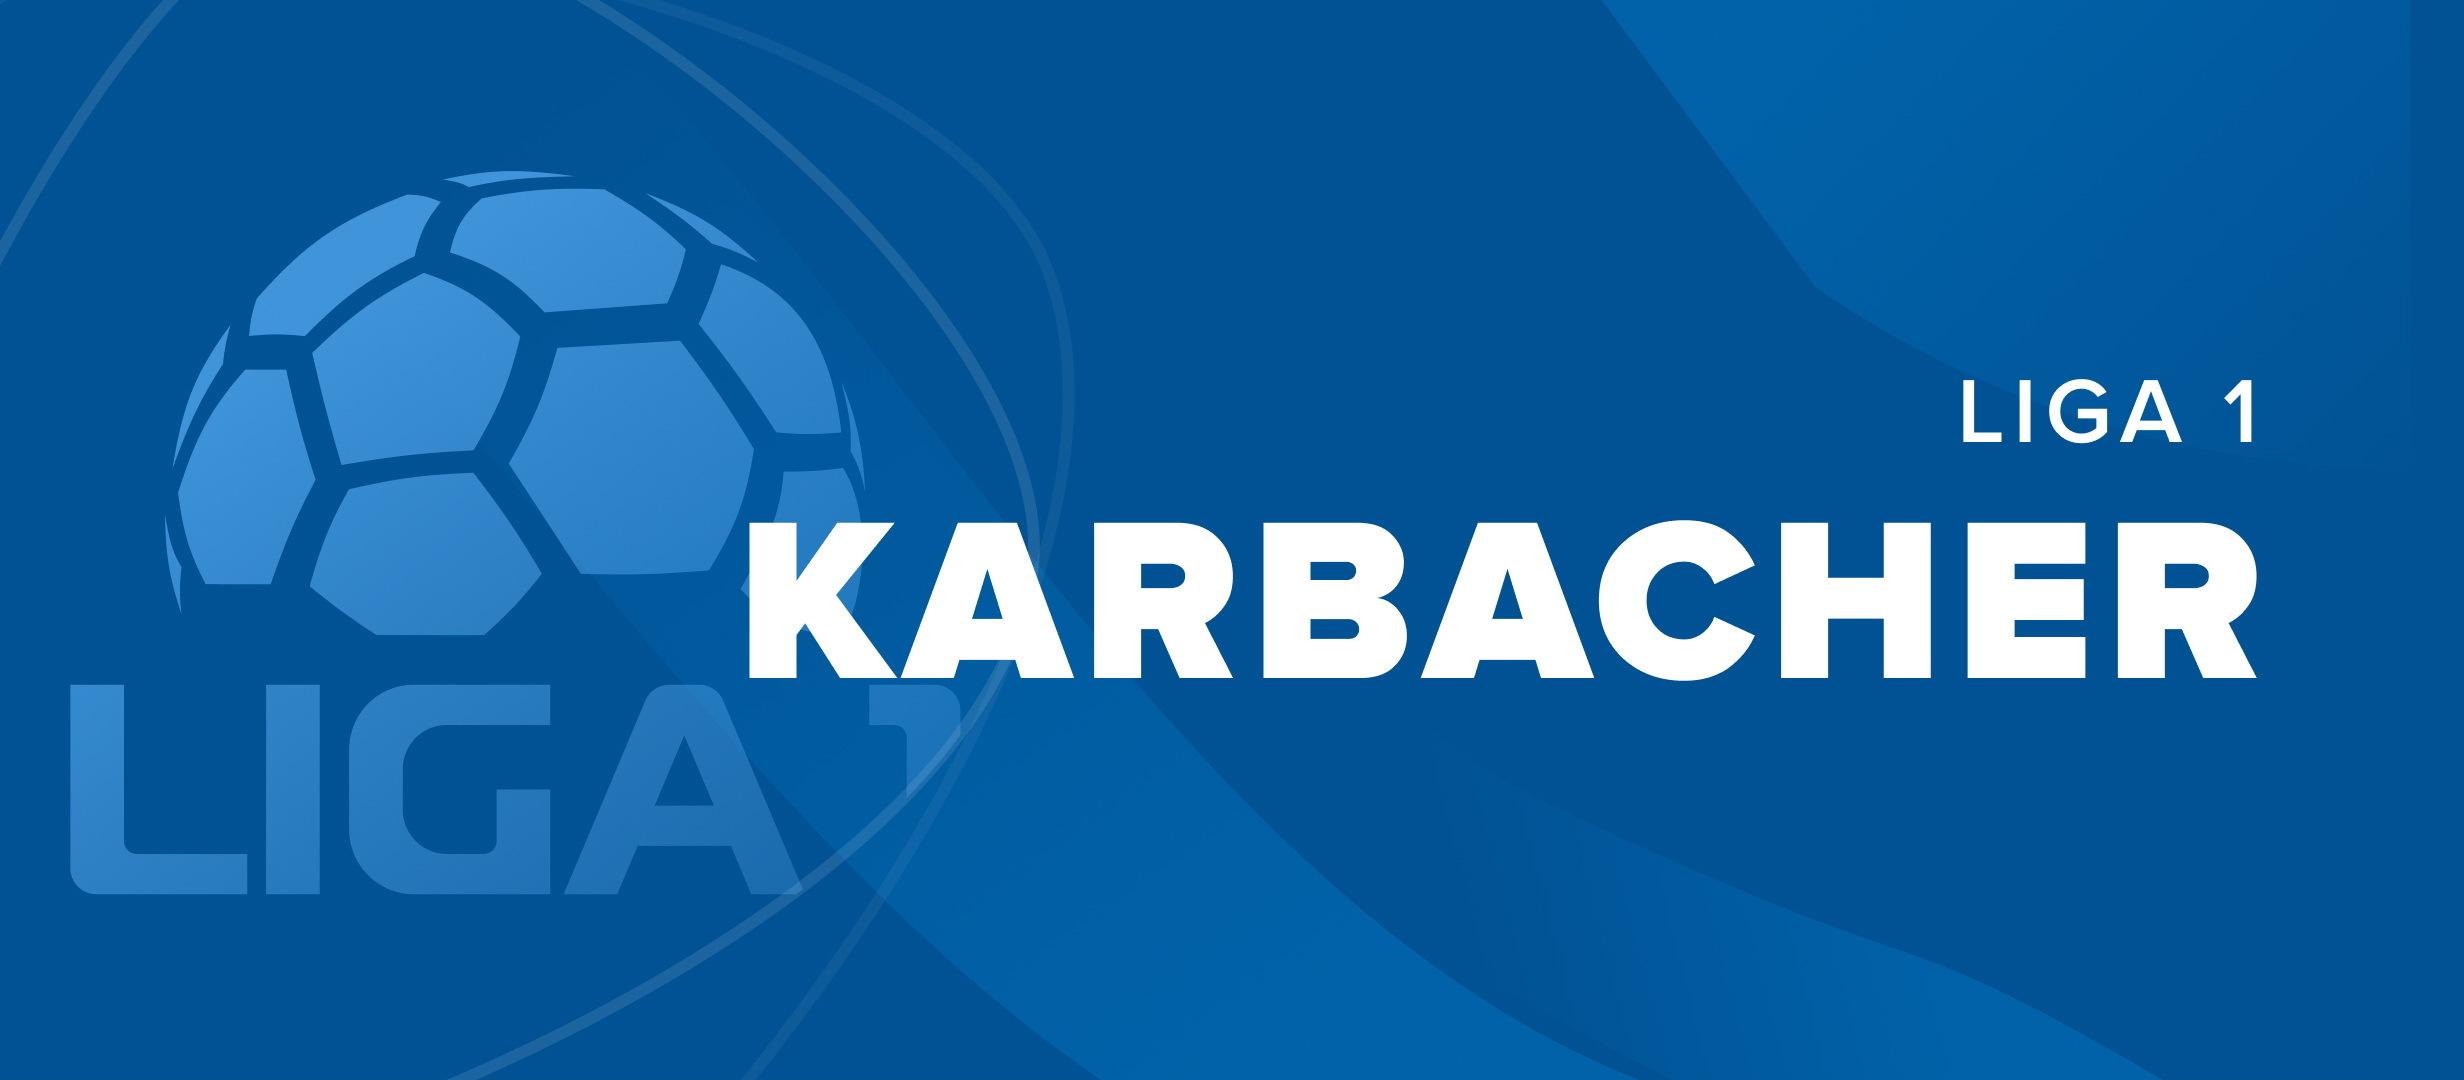 Cum pariez pe Liga 1 - interviu cu expertul Legalbet Karbacher